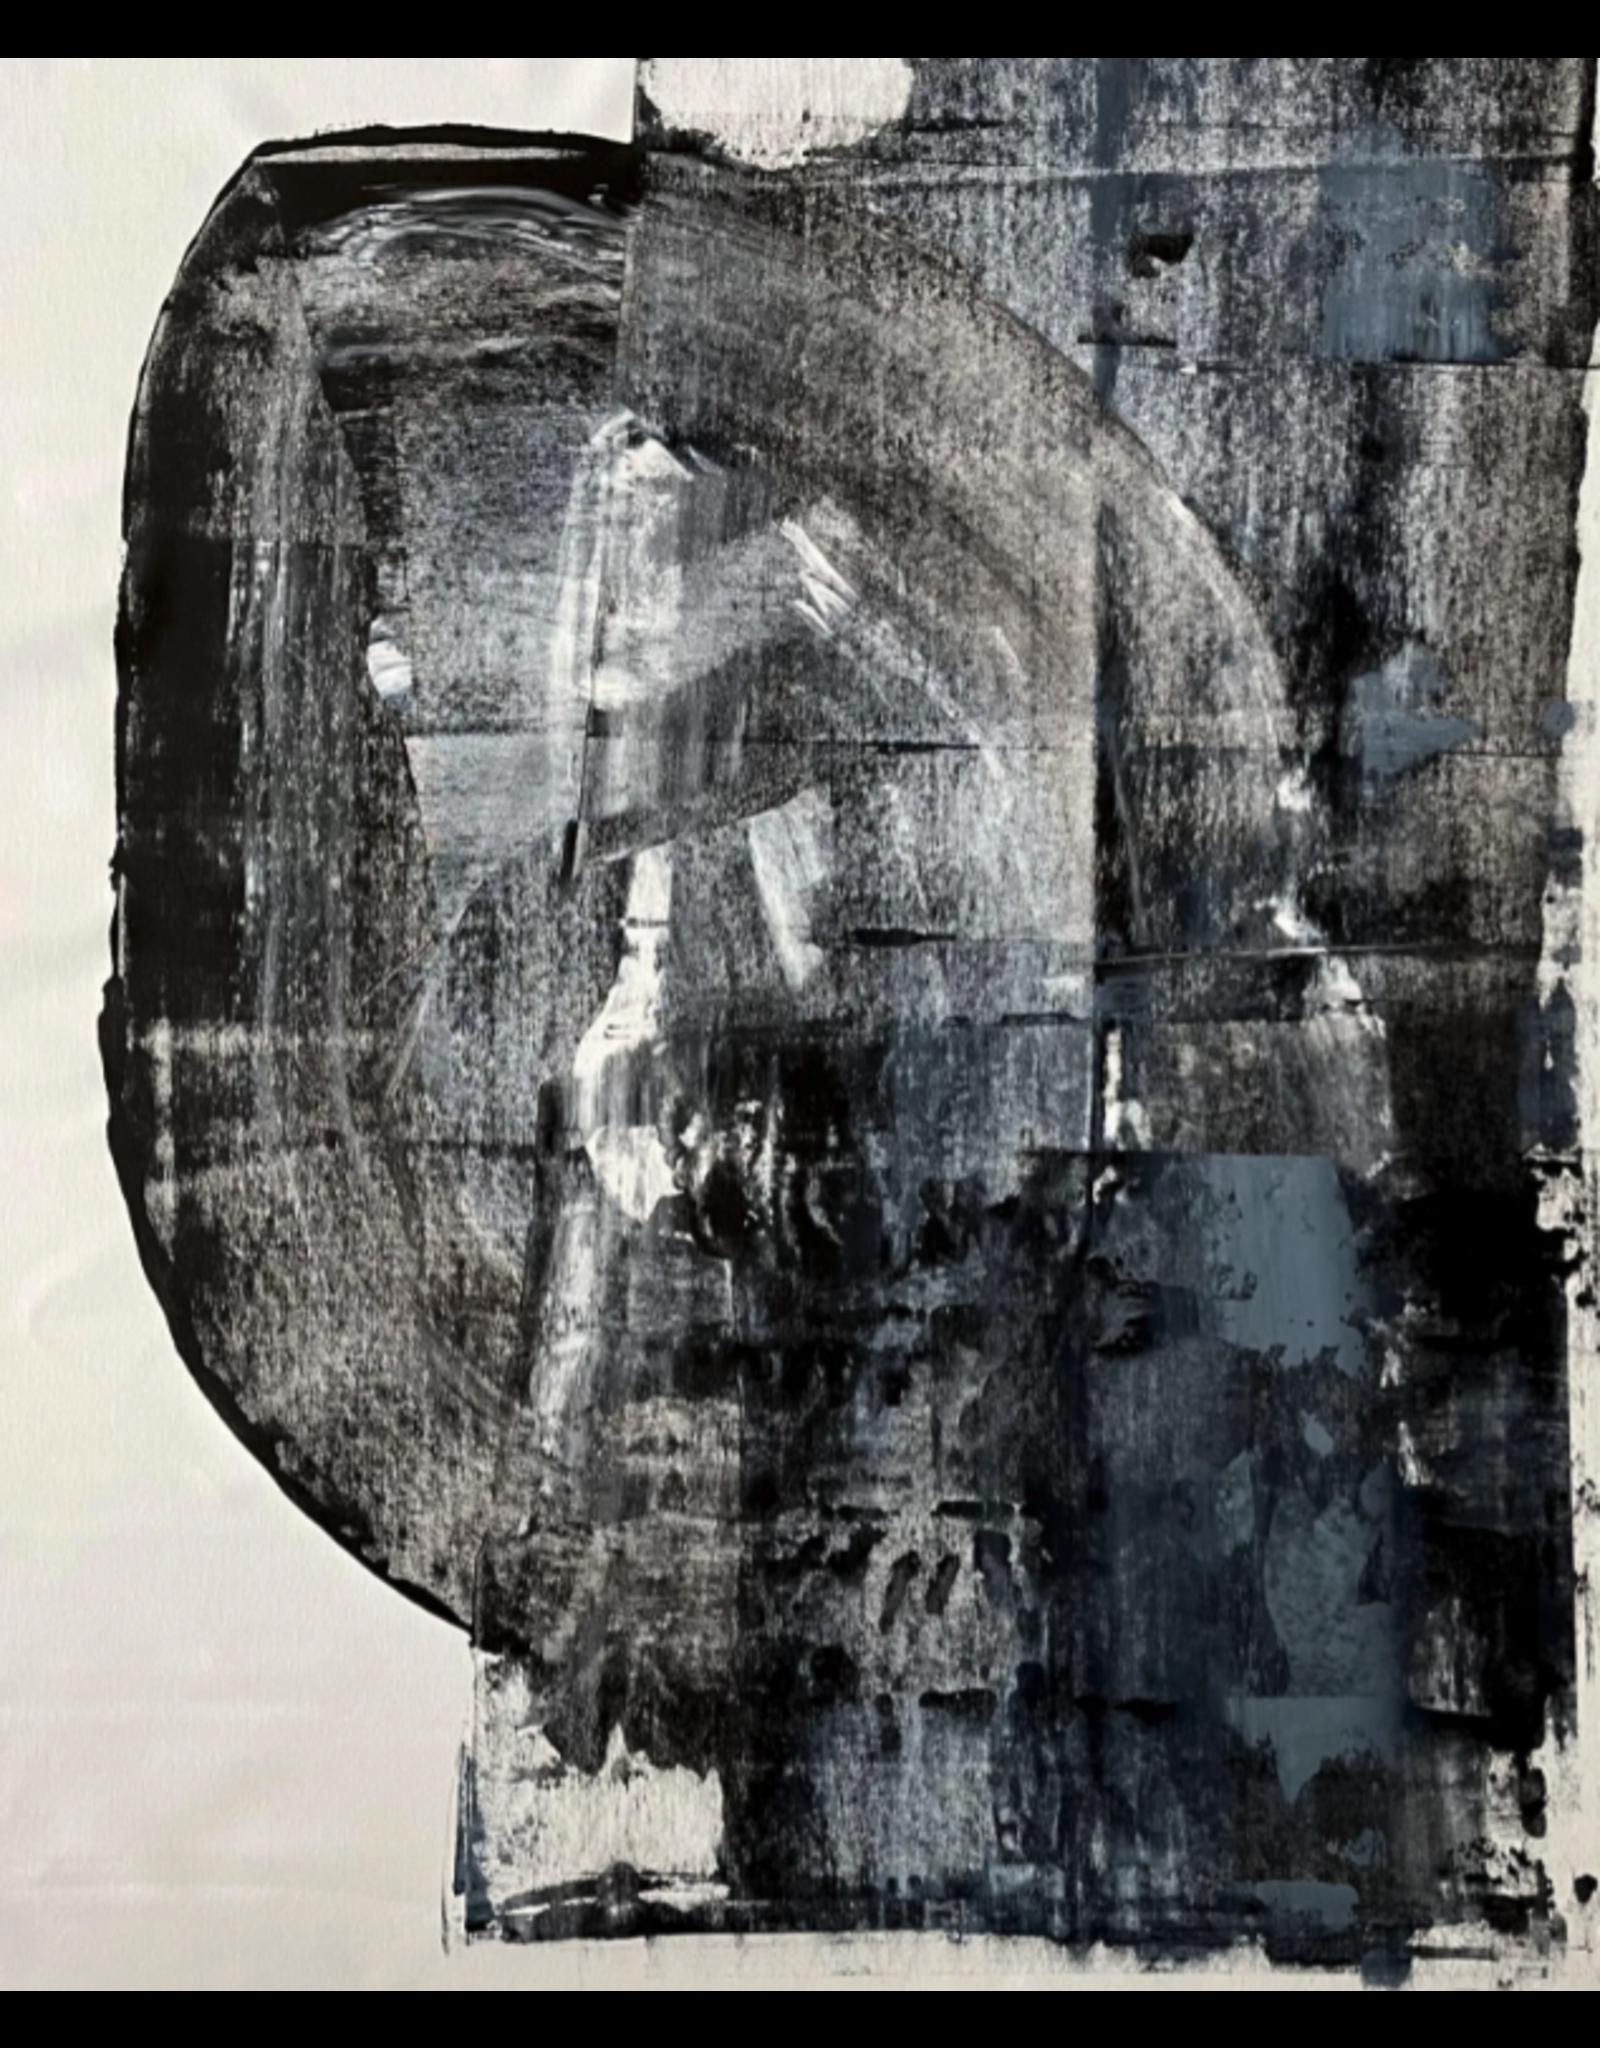 Abstract minimalist - acrylic on canvas #4